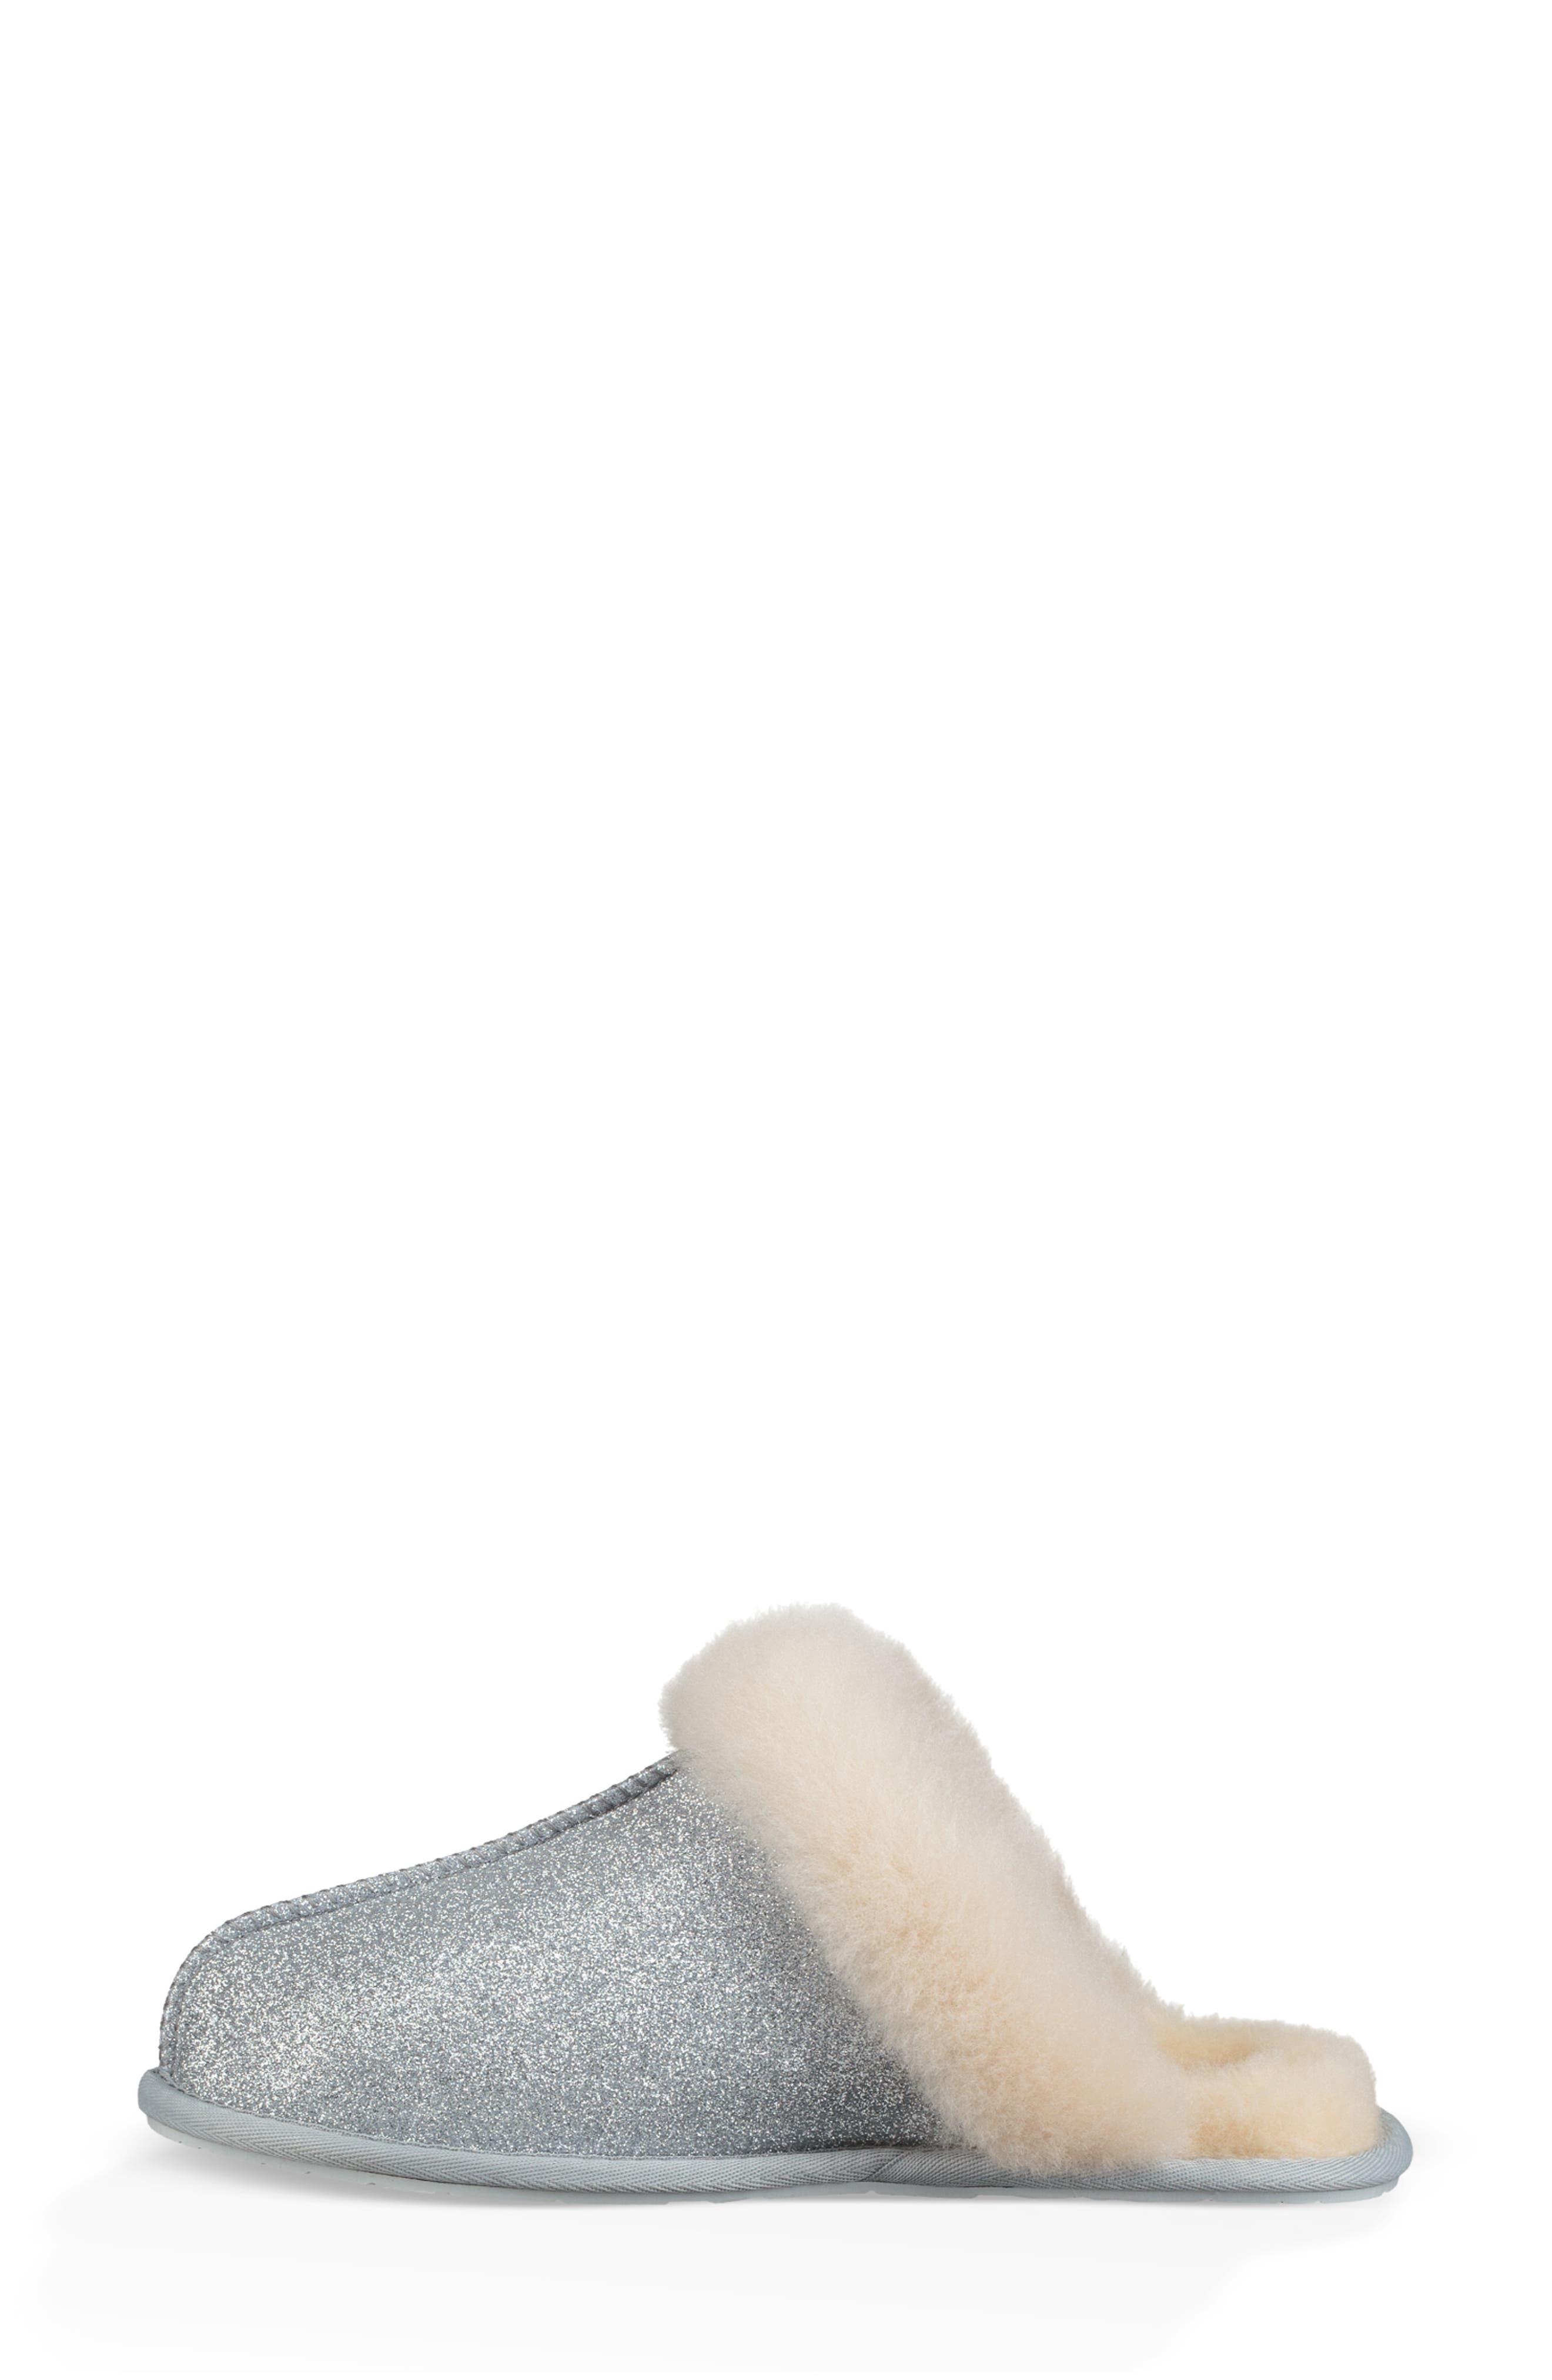 UGG<SUP>®</SUP>, Scuffette II Sparkle Genuine Shearling Slipper, Alternate thumbnail 6, color, SILVER